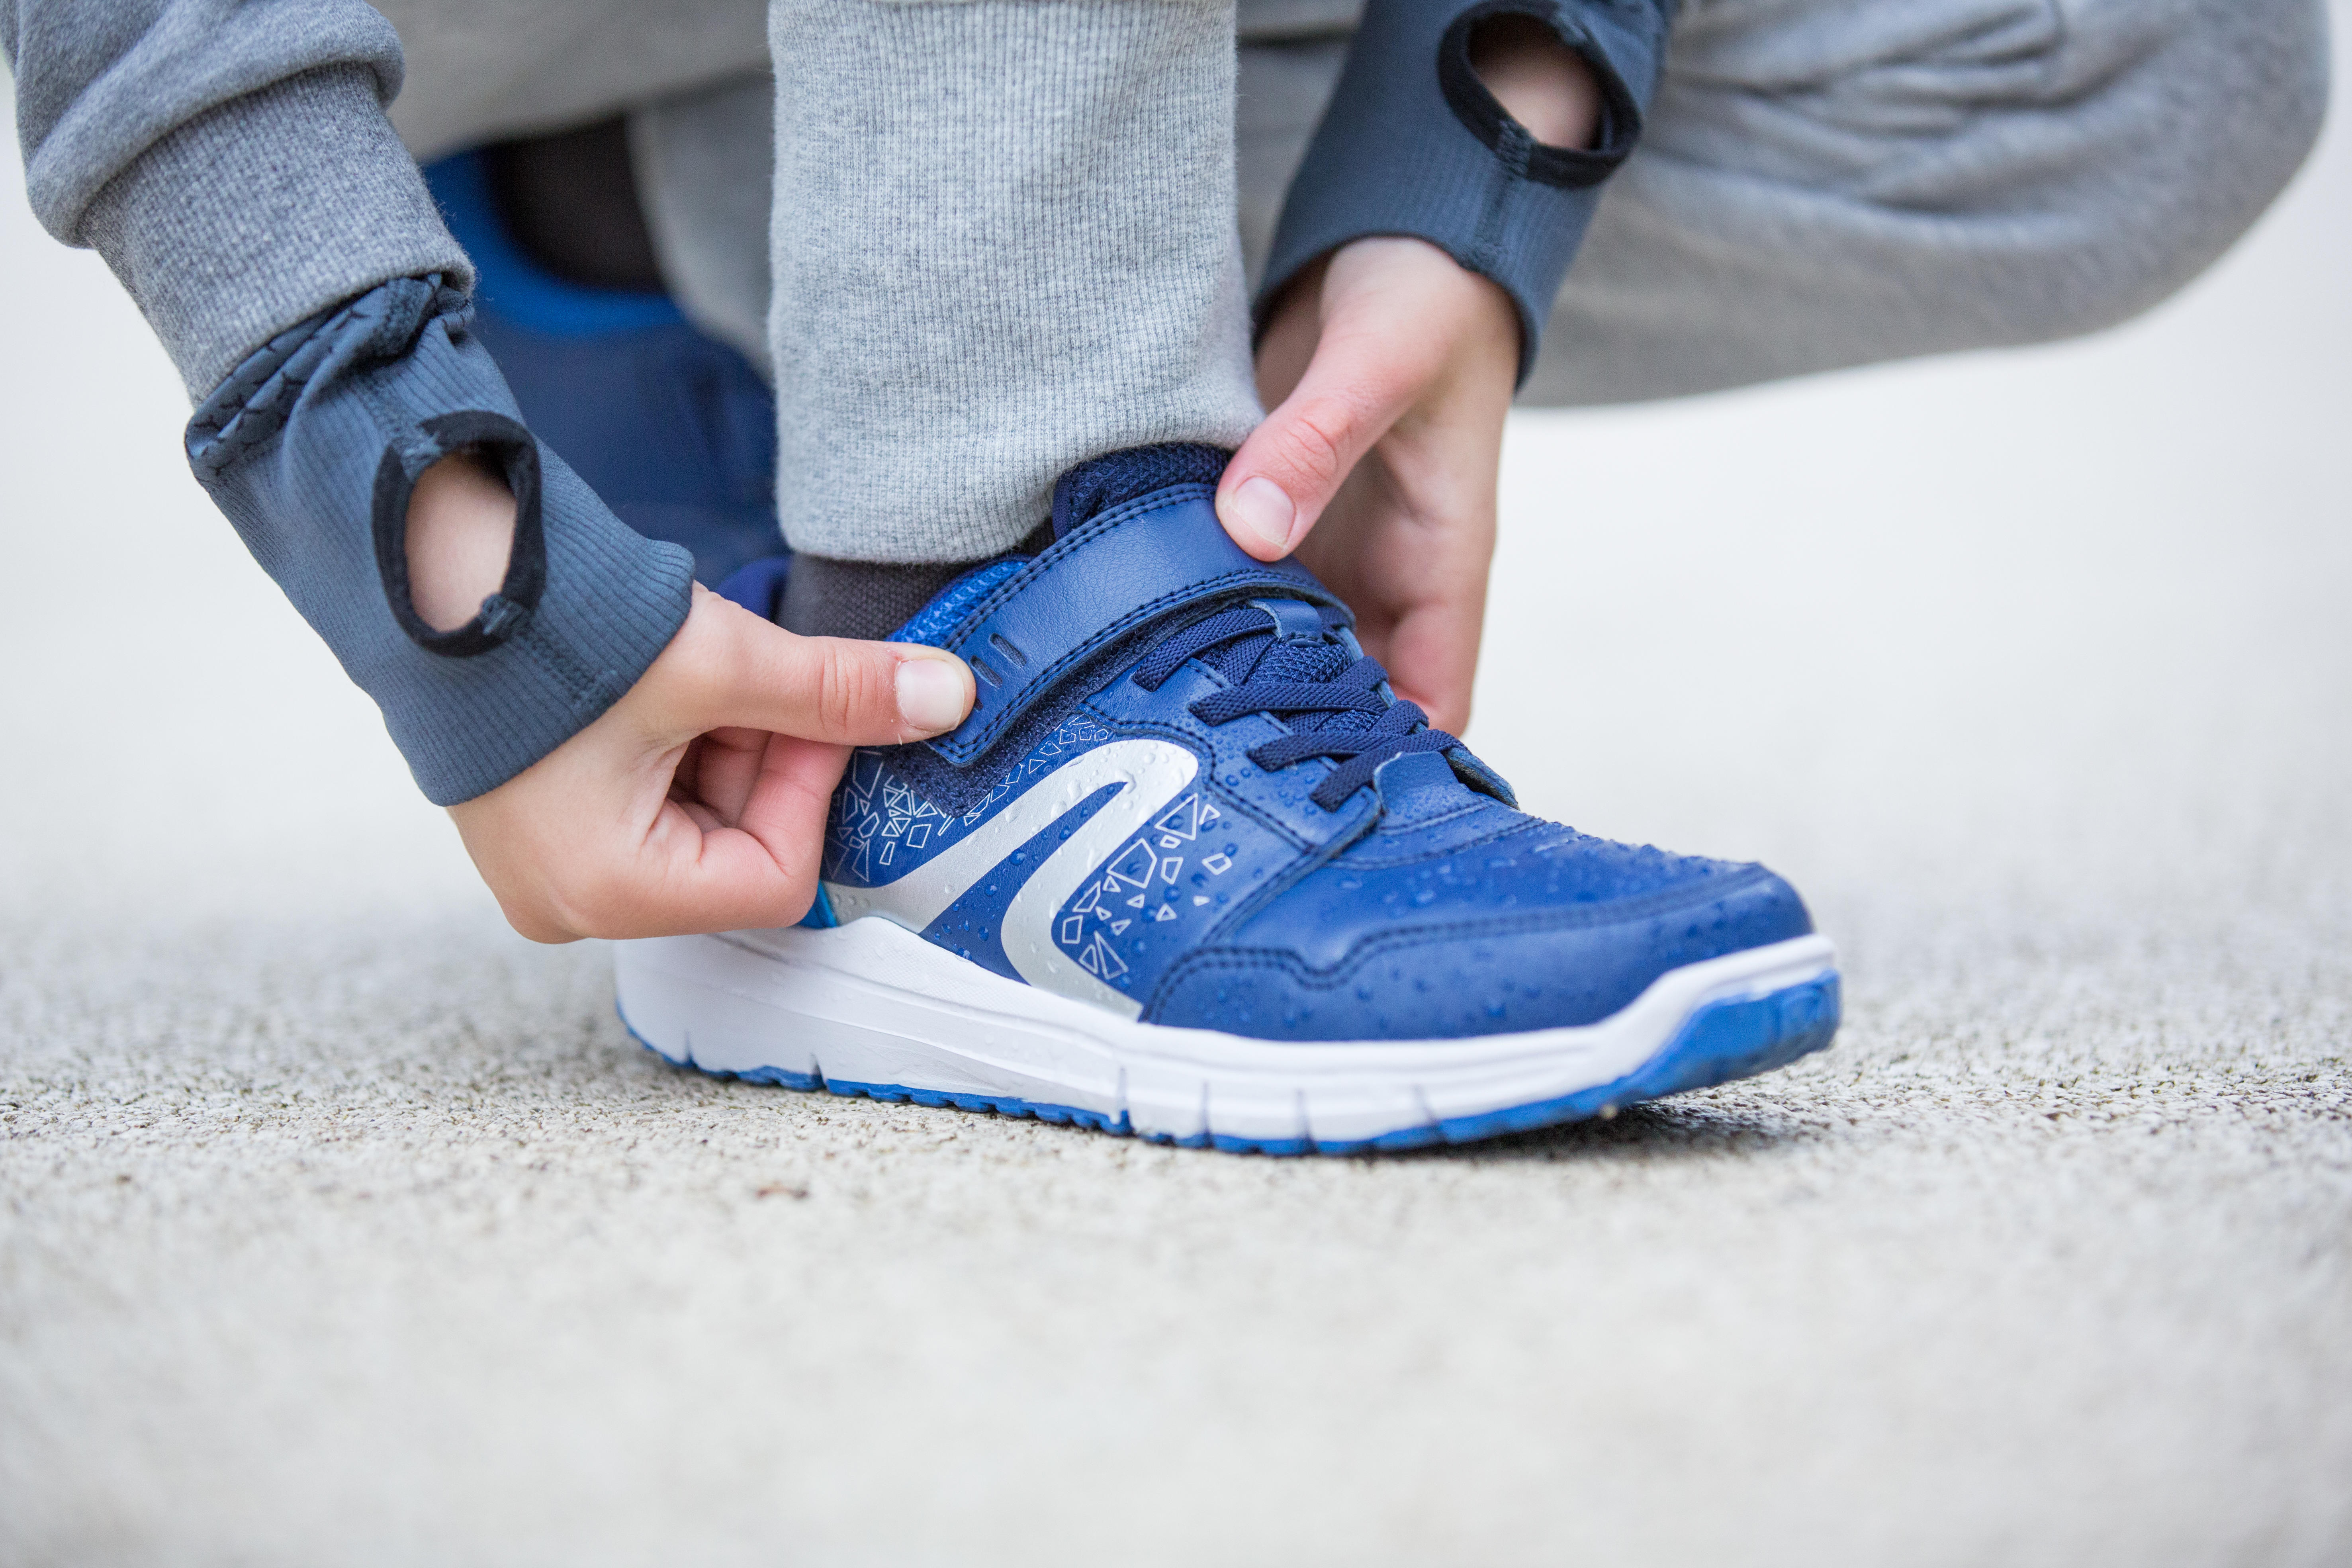 Chaussures marche enfant Protect 140 marine